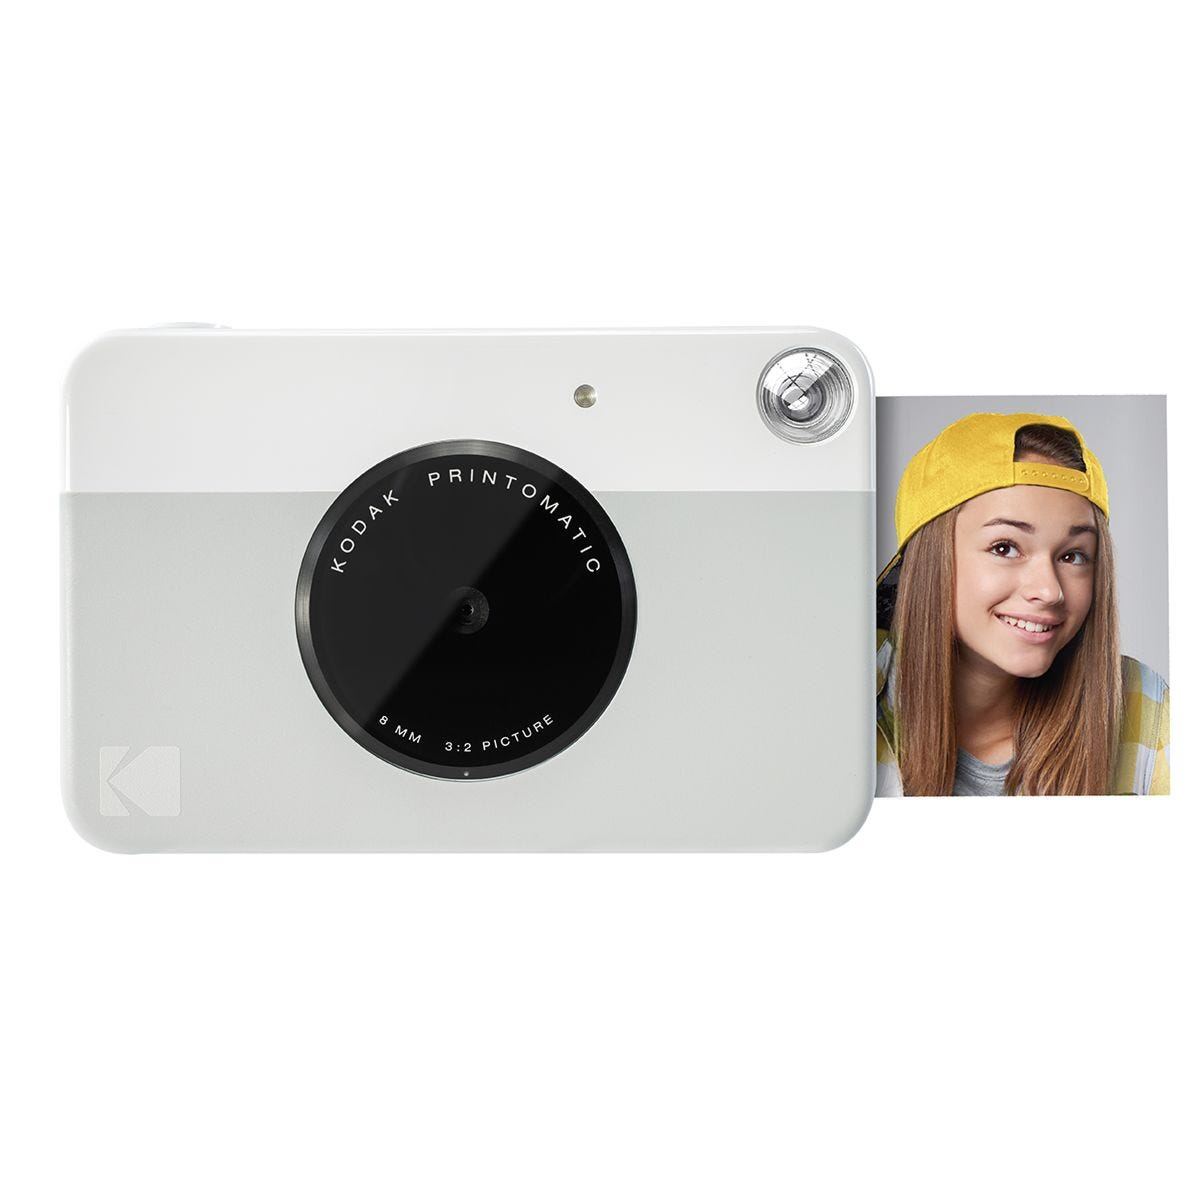 Kodak Printomatic Digital Instant Print Camera - Grey